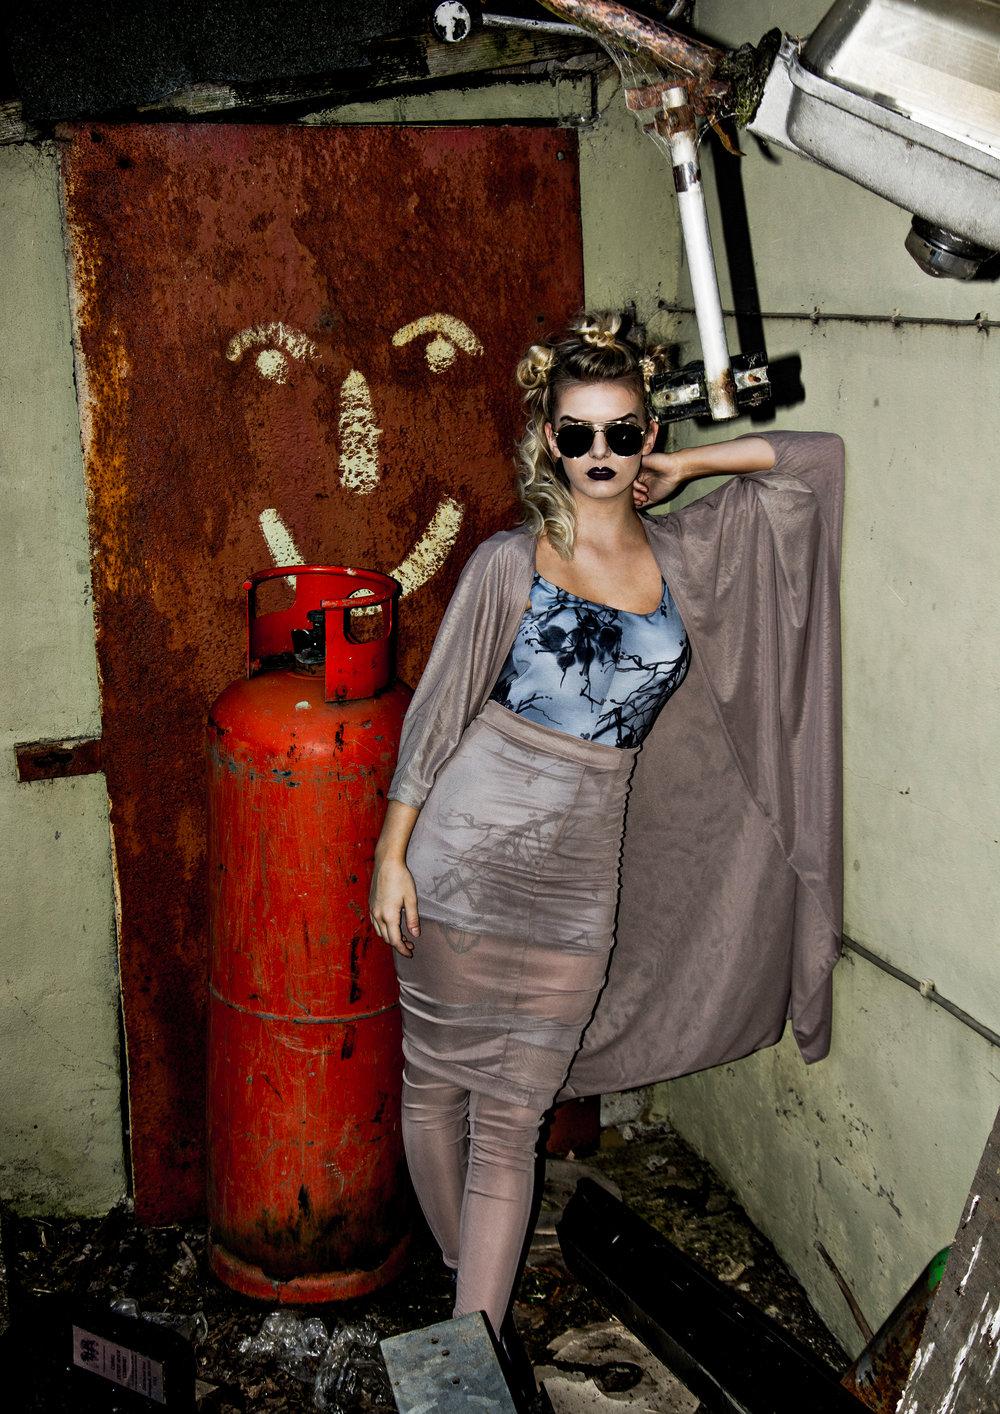 zaramia-ava-zaramiaava-leeds-fashion-designer-ethical-sustainable-nude-versatile-drape-ayame-jacket-yuko-skirt-obi-print-bodysuit-womenswear-grunge-1